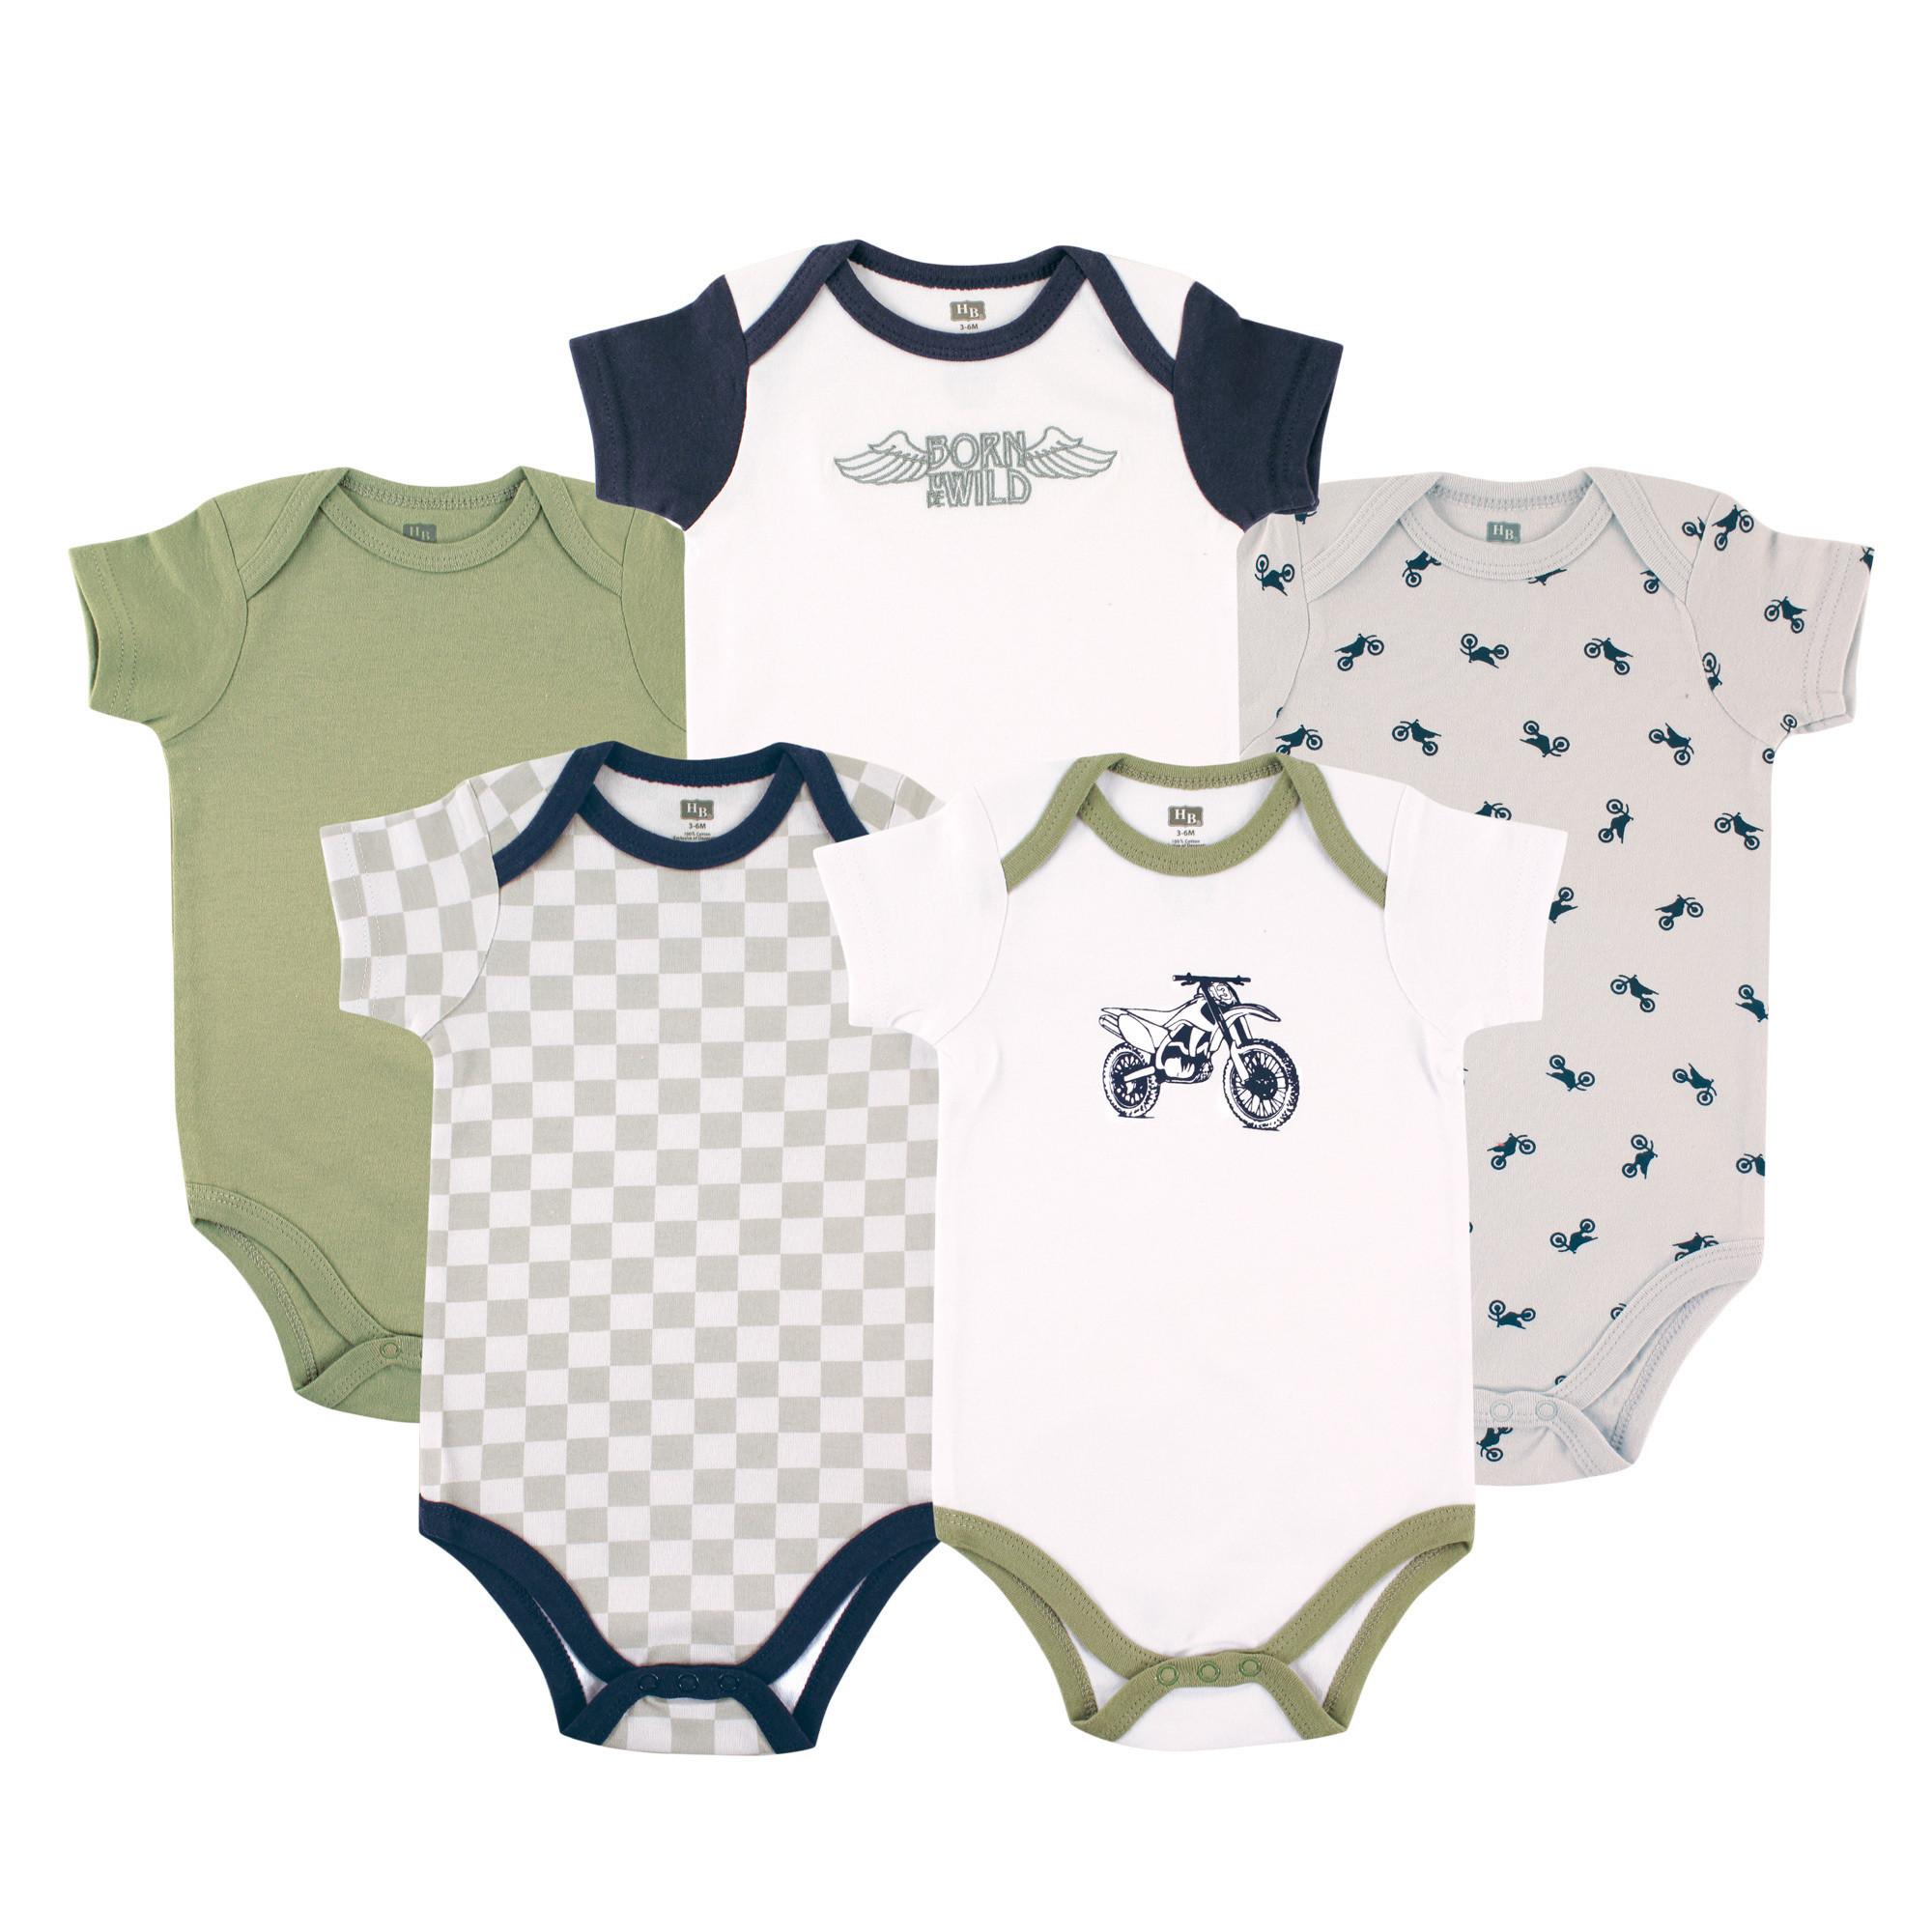 Hudson baby Clothing Bodysuits